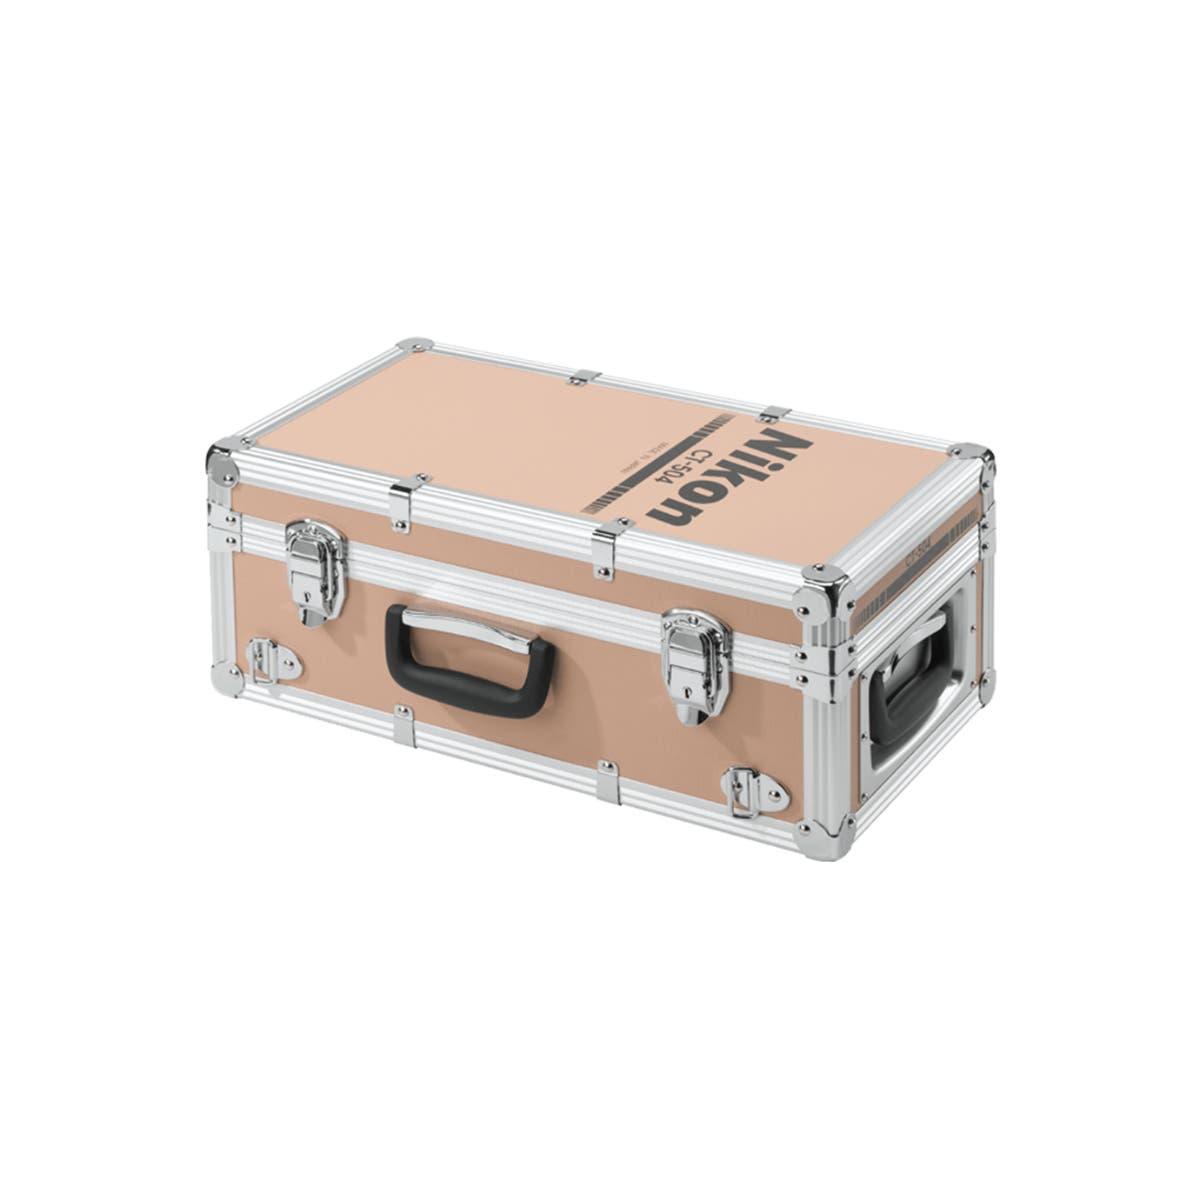 CT-504 Trunk Case